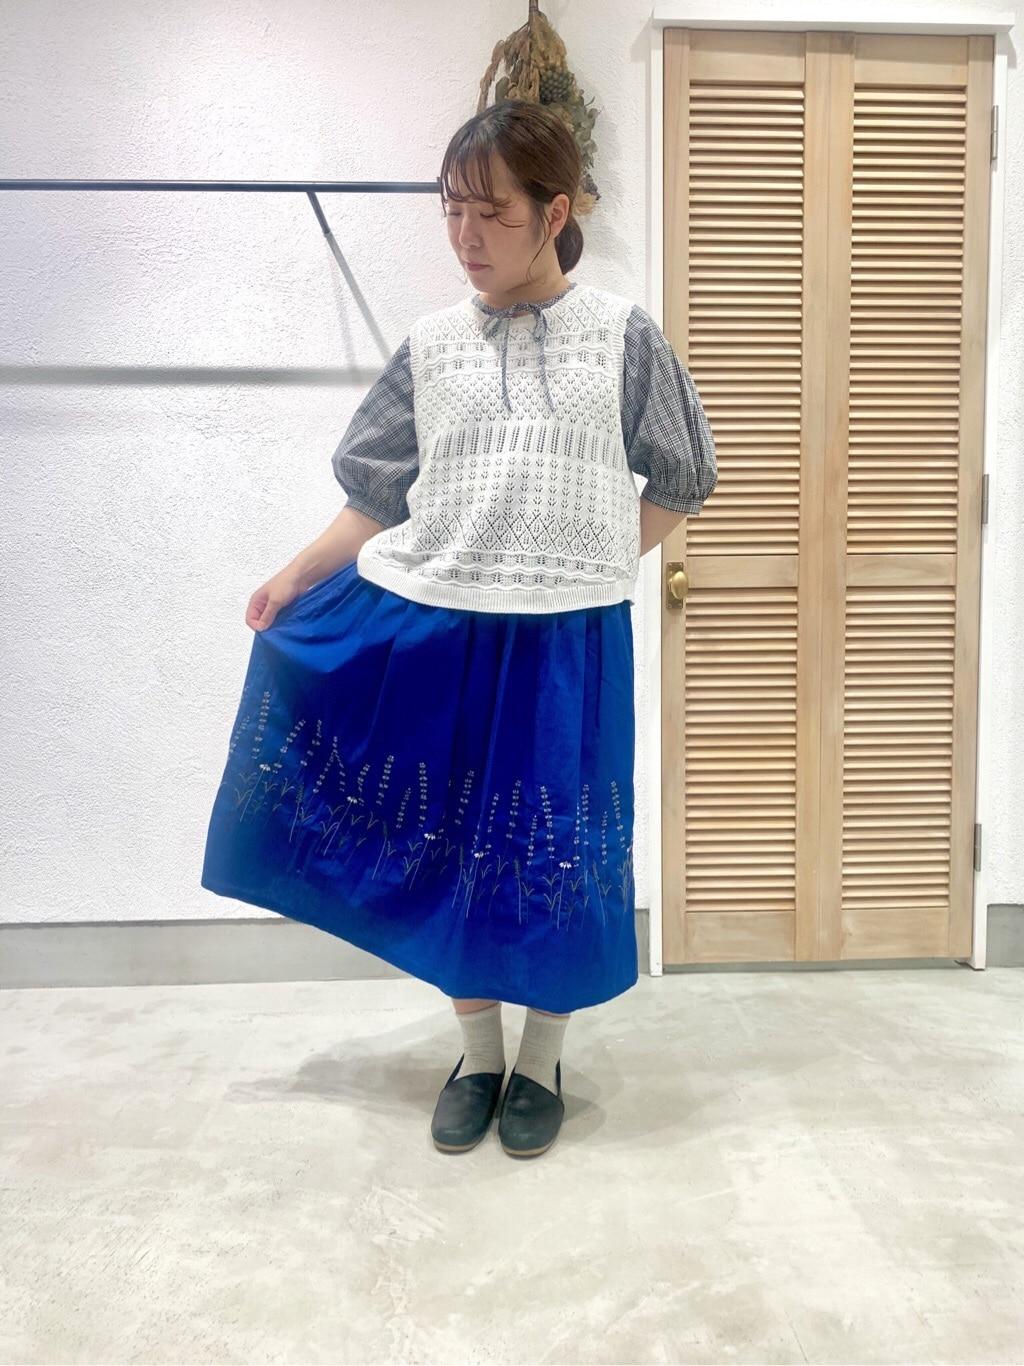 chambre de charme 横浜ジョイナス 身長:155cm 2020.07.31